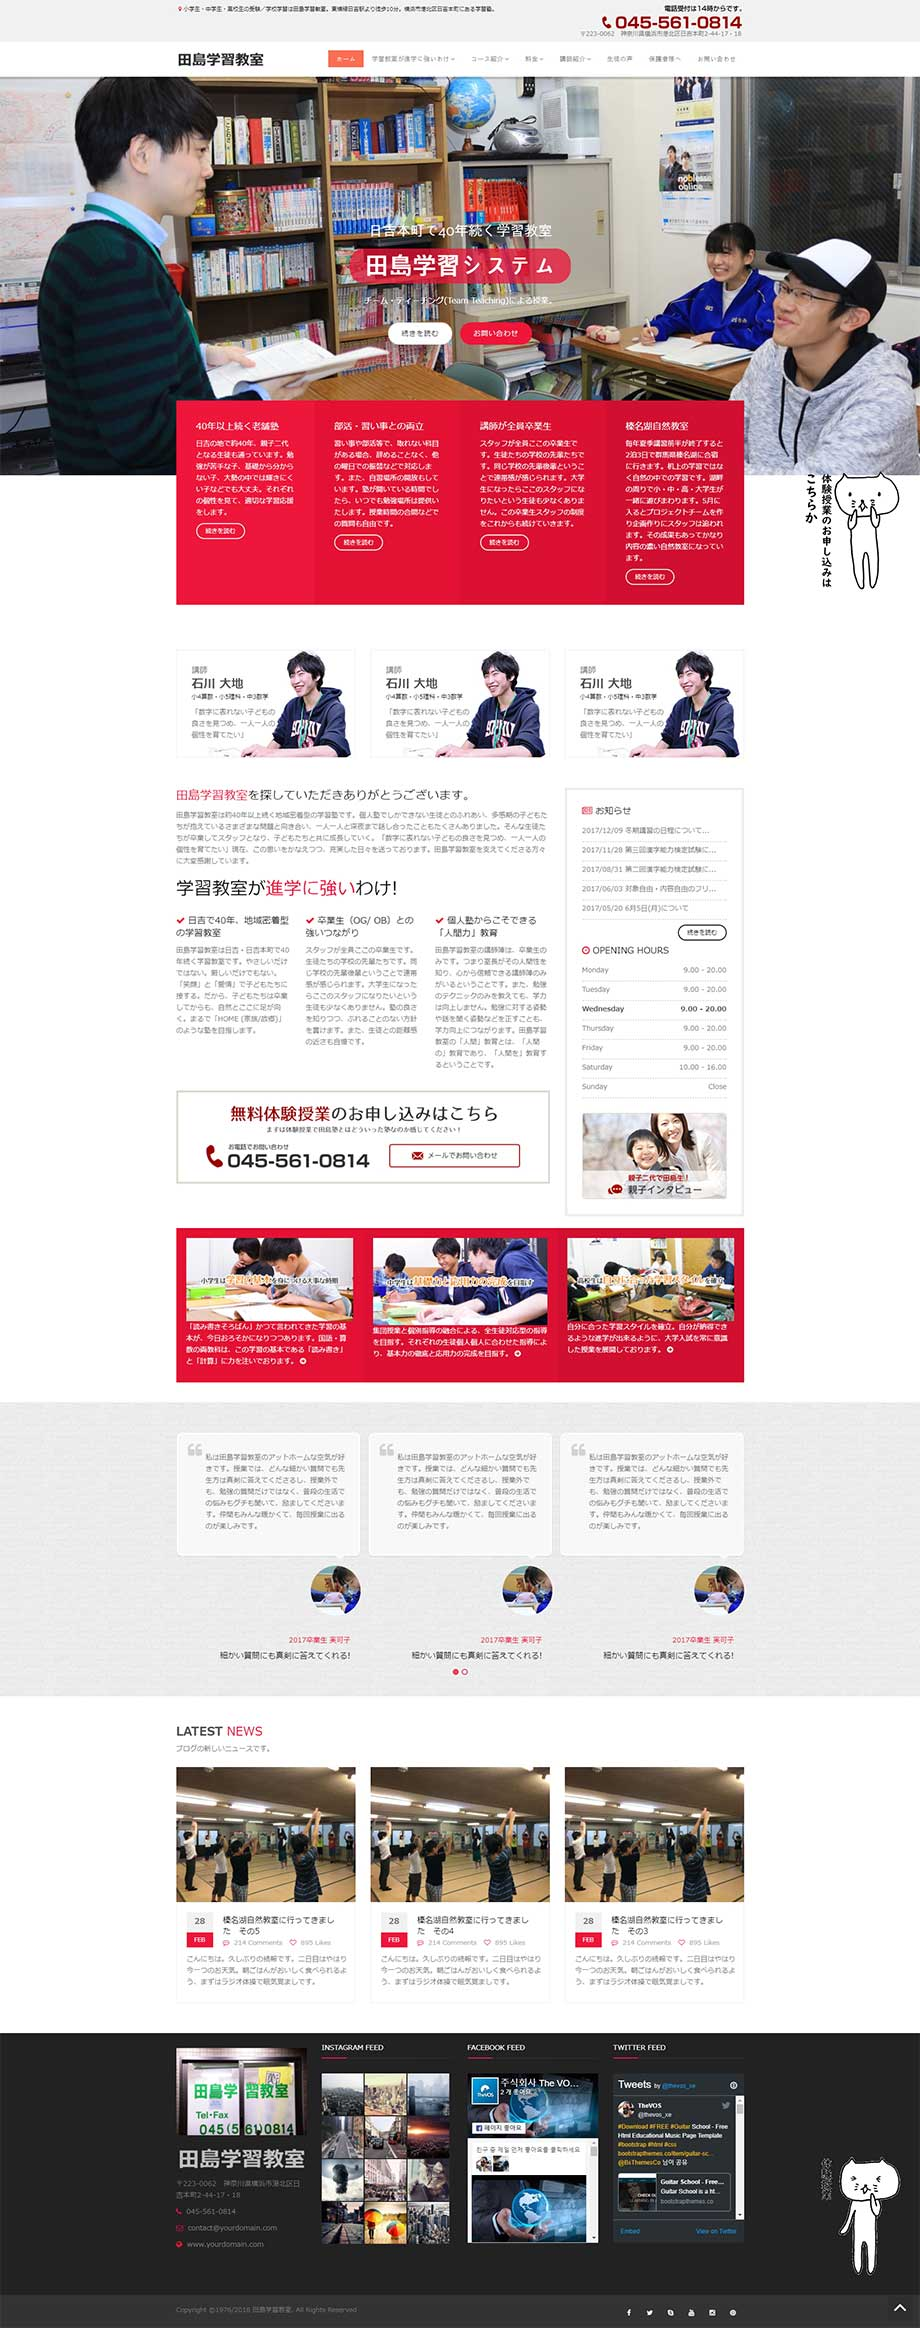 proposition-tajima-001.jpg